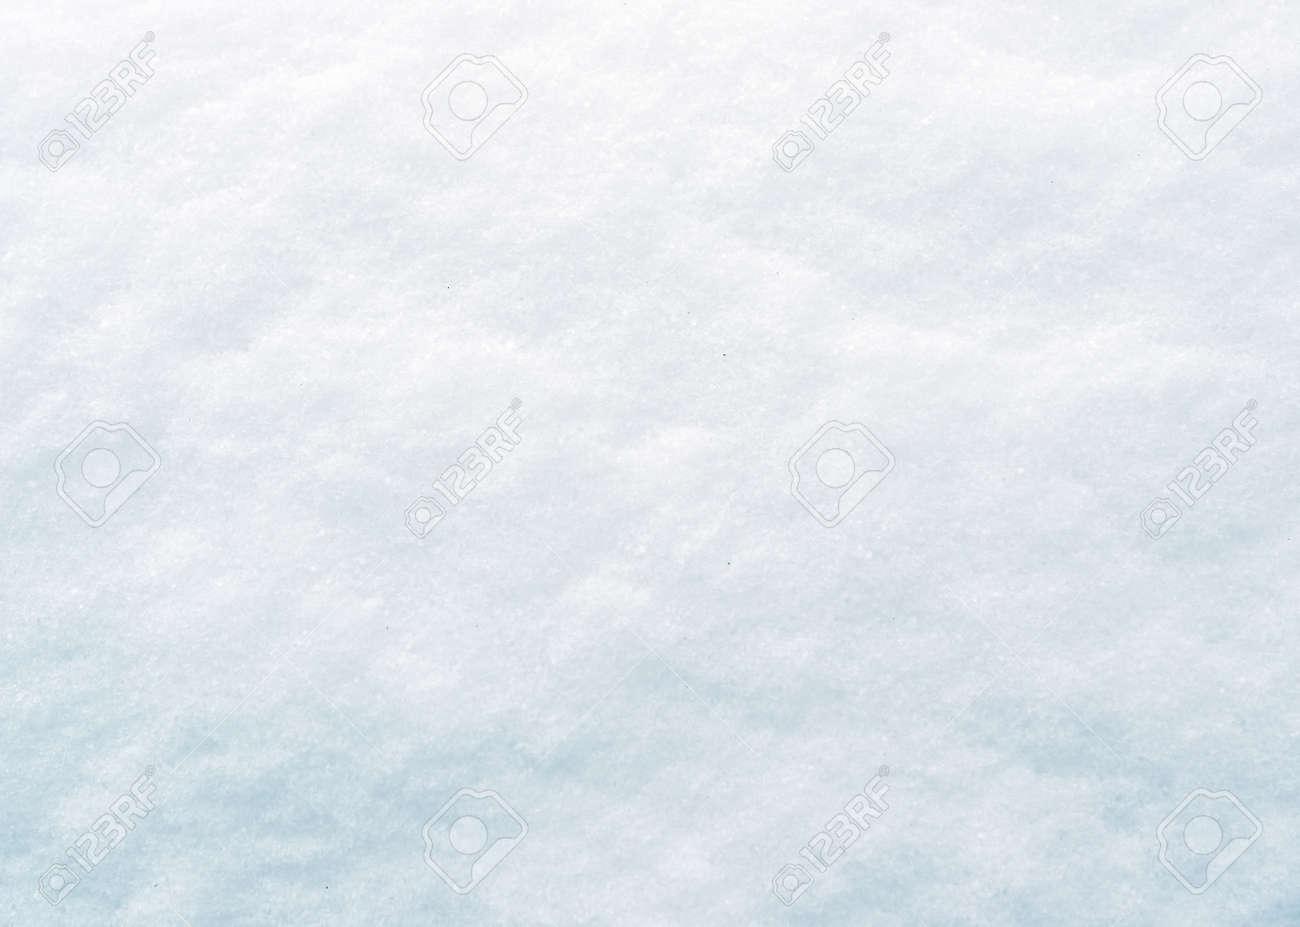 fresh snow texture Standard-Bild - 47606972